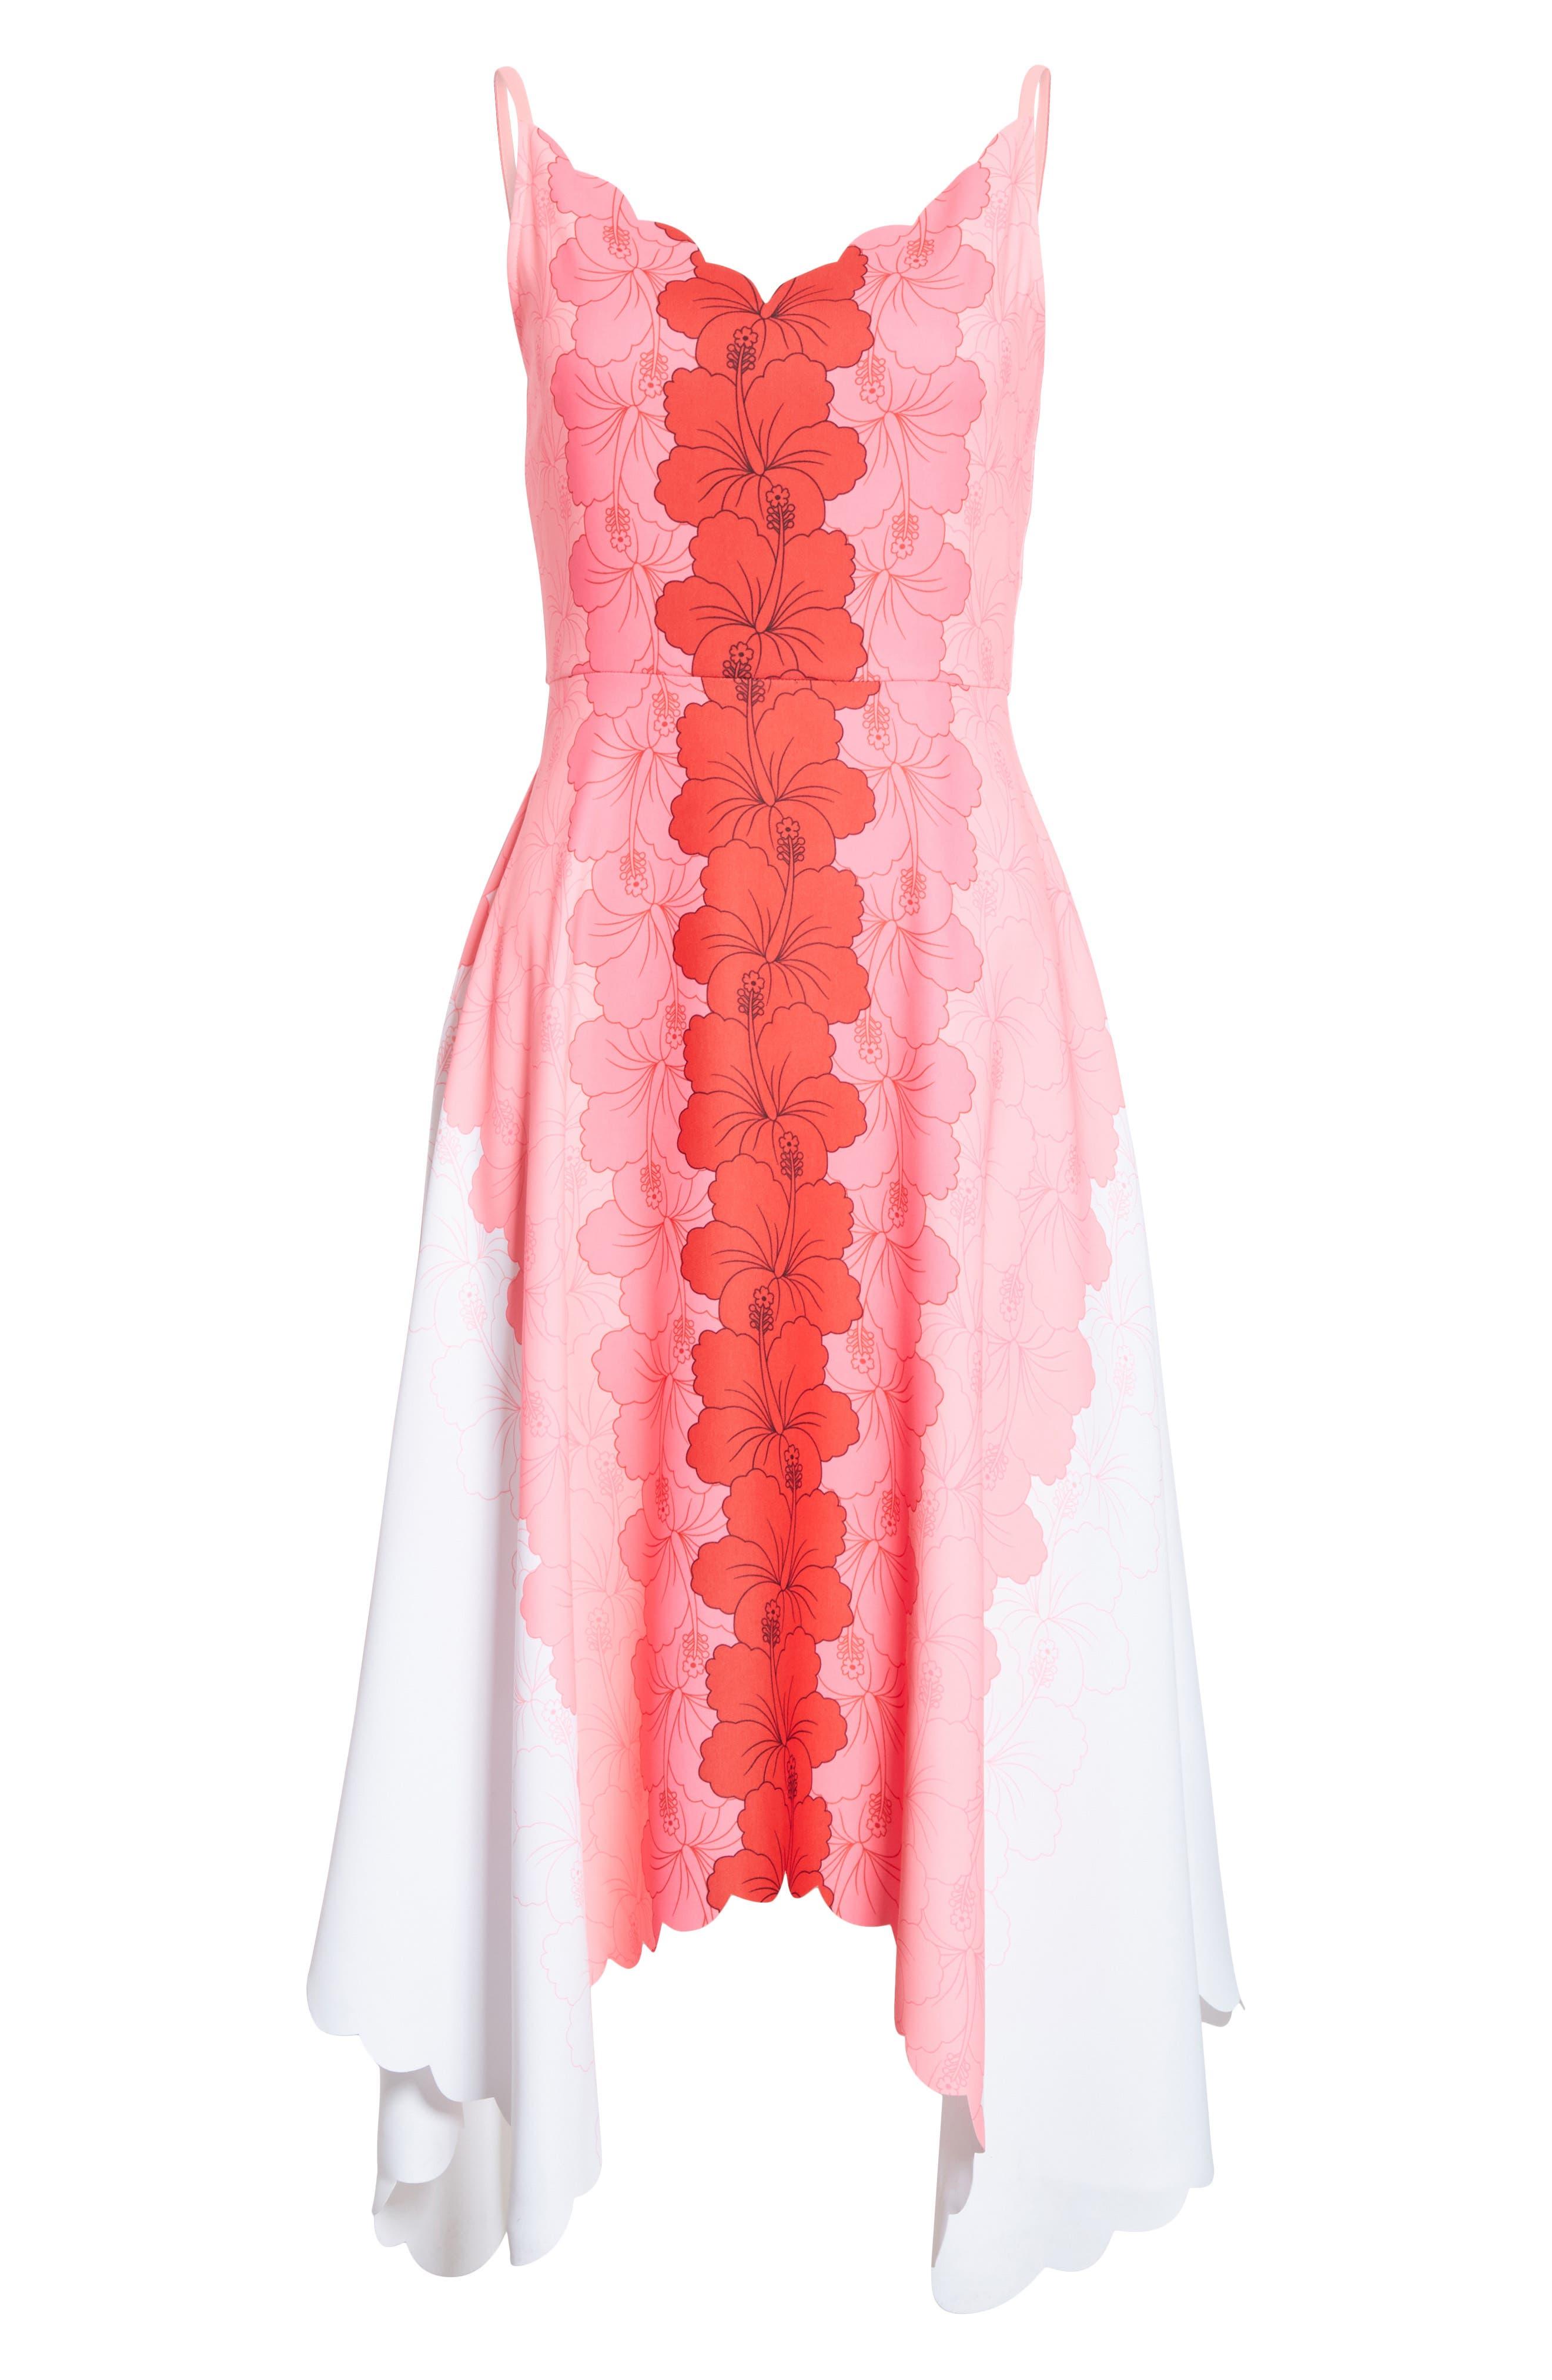 Ritsa Happiness Dress,                             Alternate thumbnail 6, color,                             671